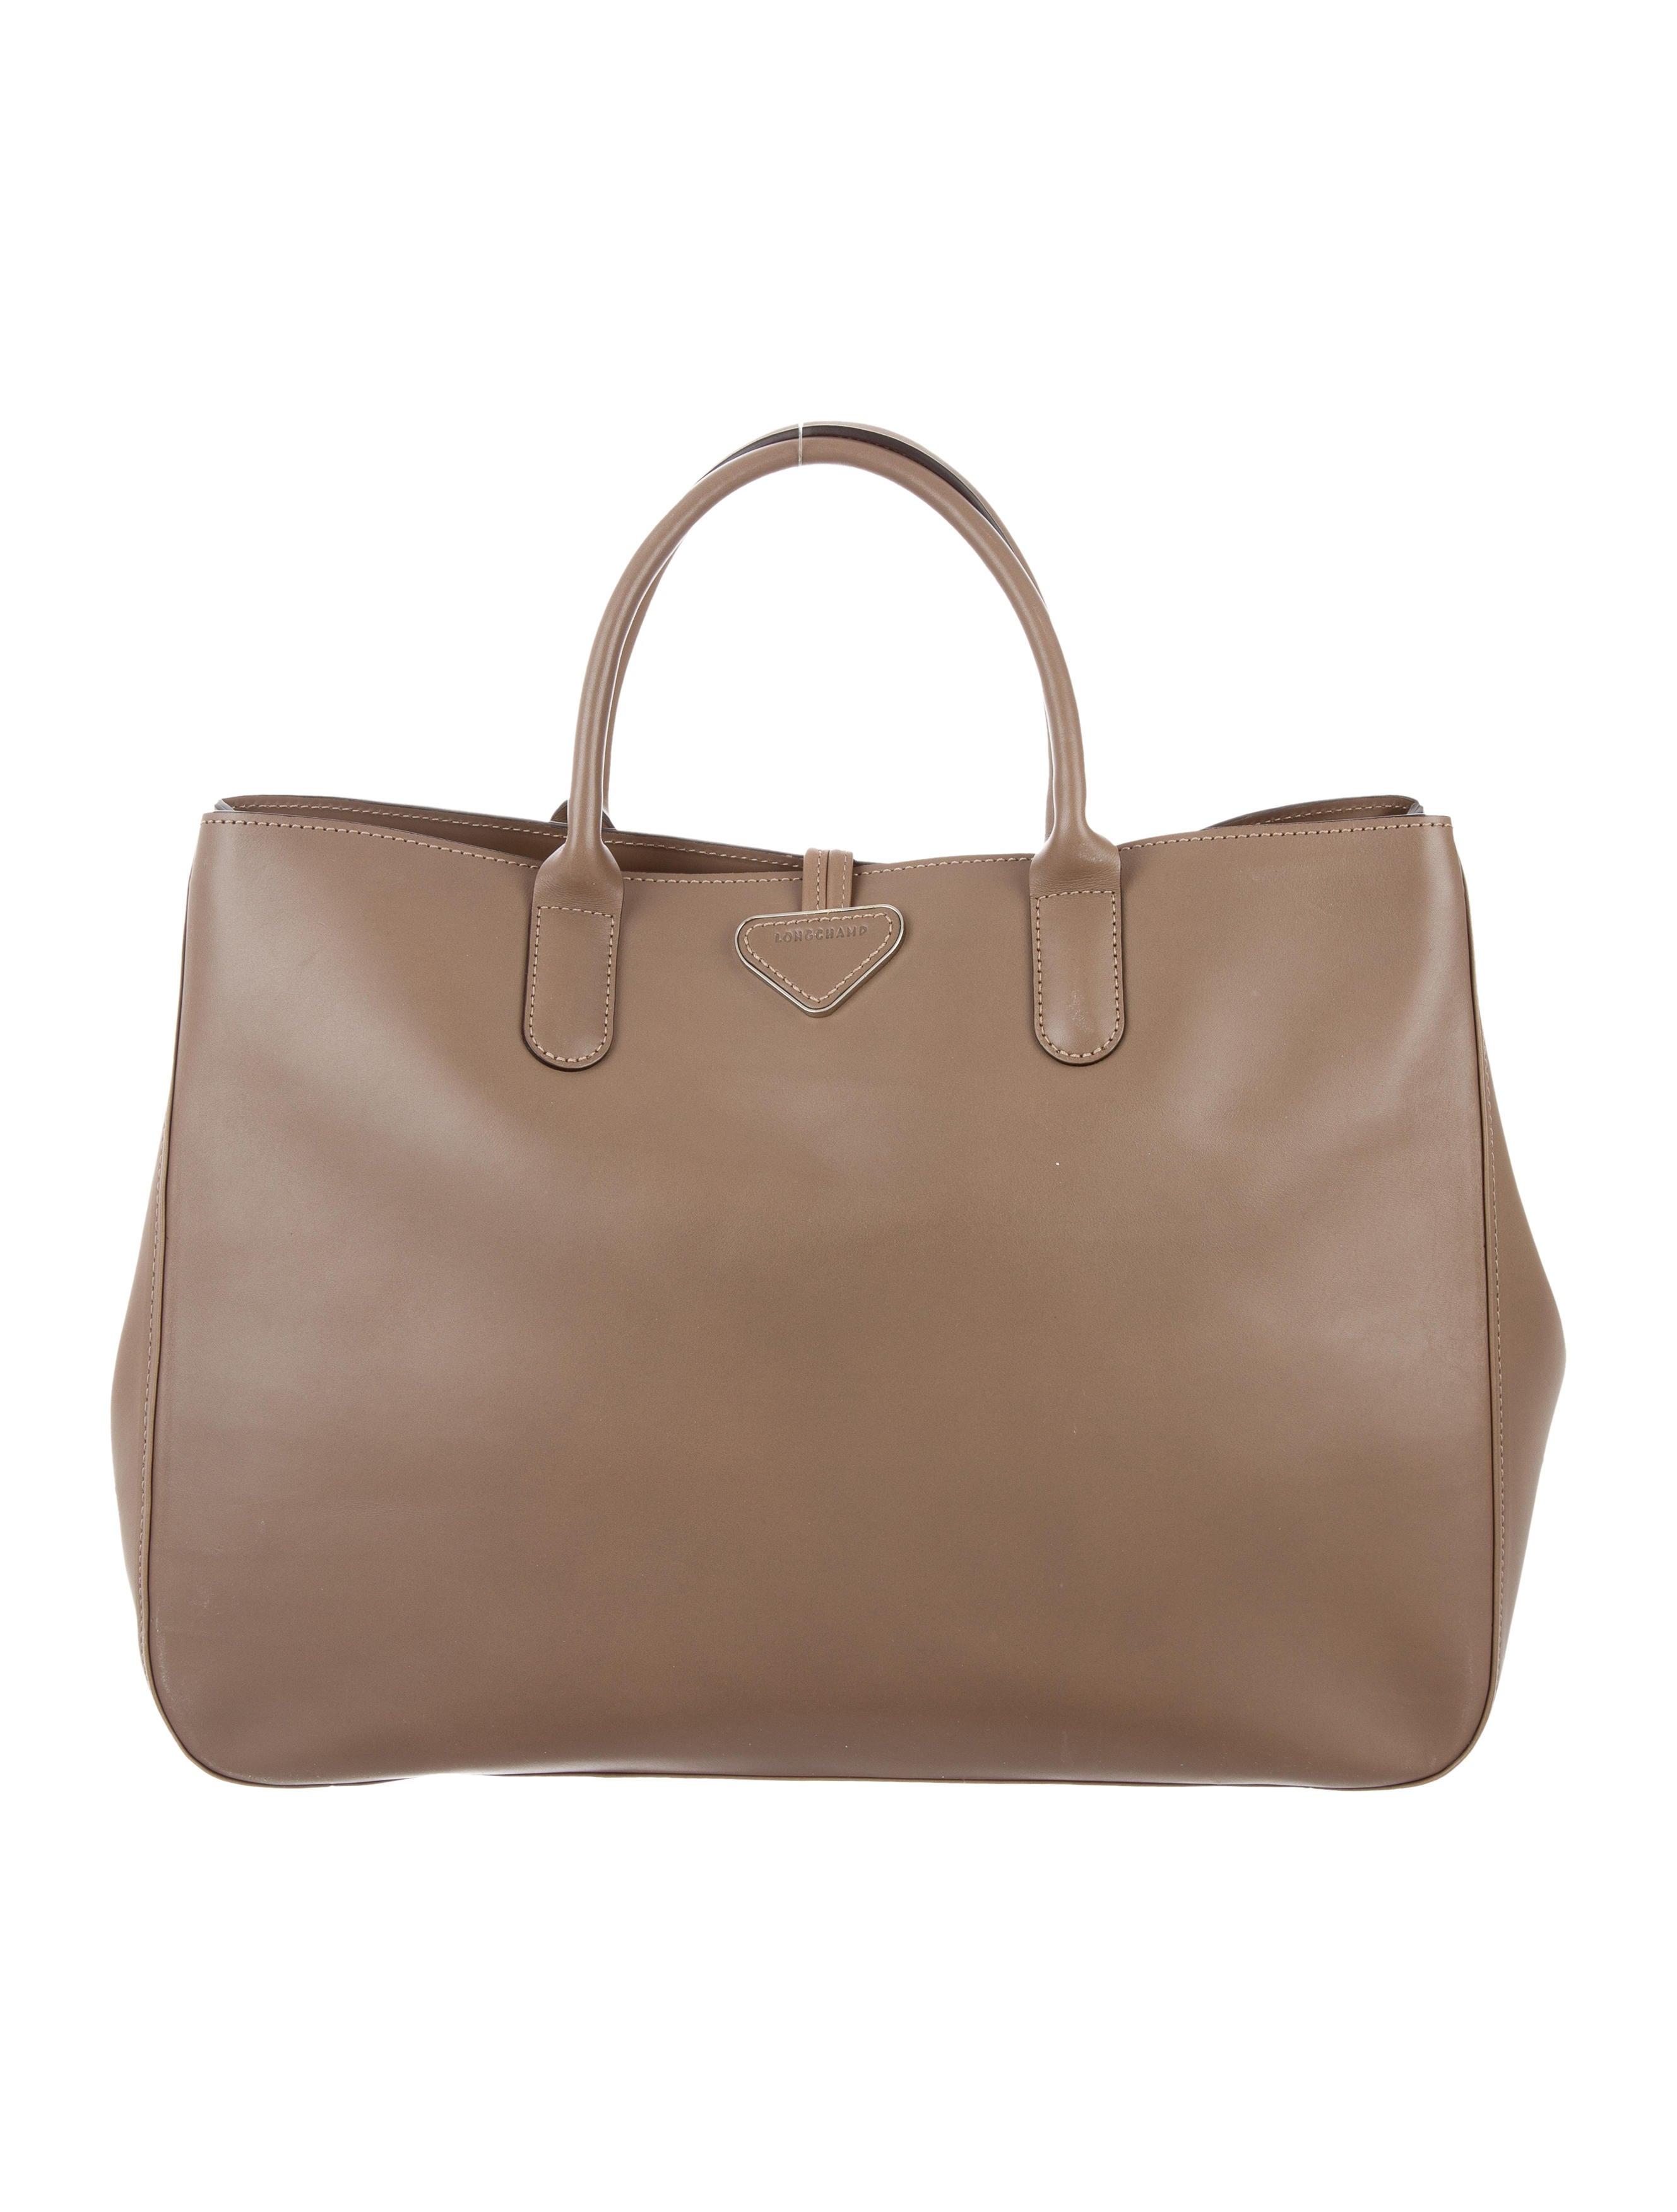 longch roseau heritage bag handbags wl820778 the